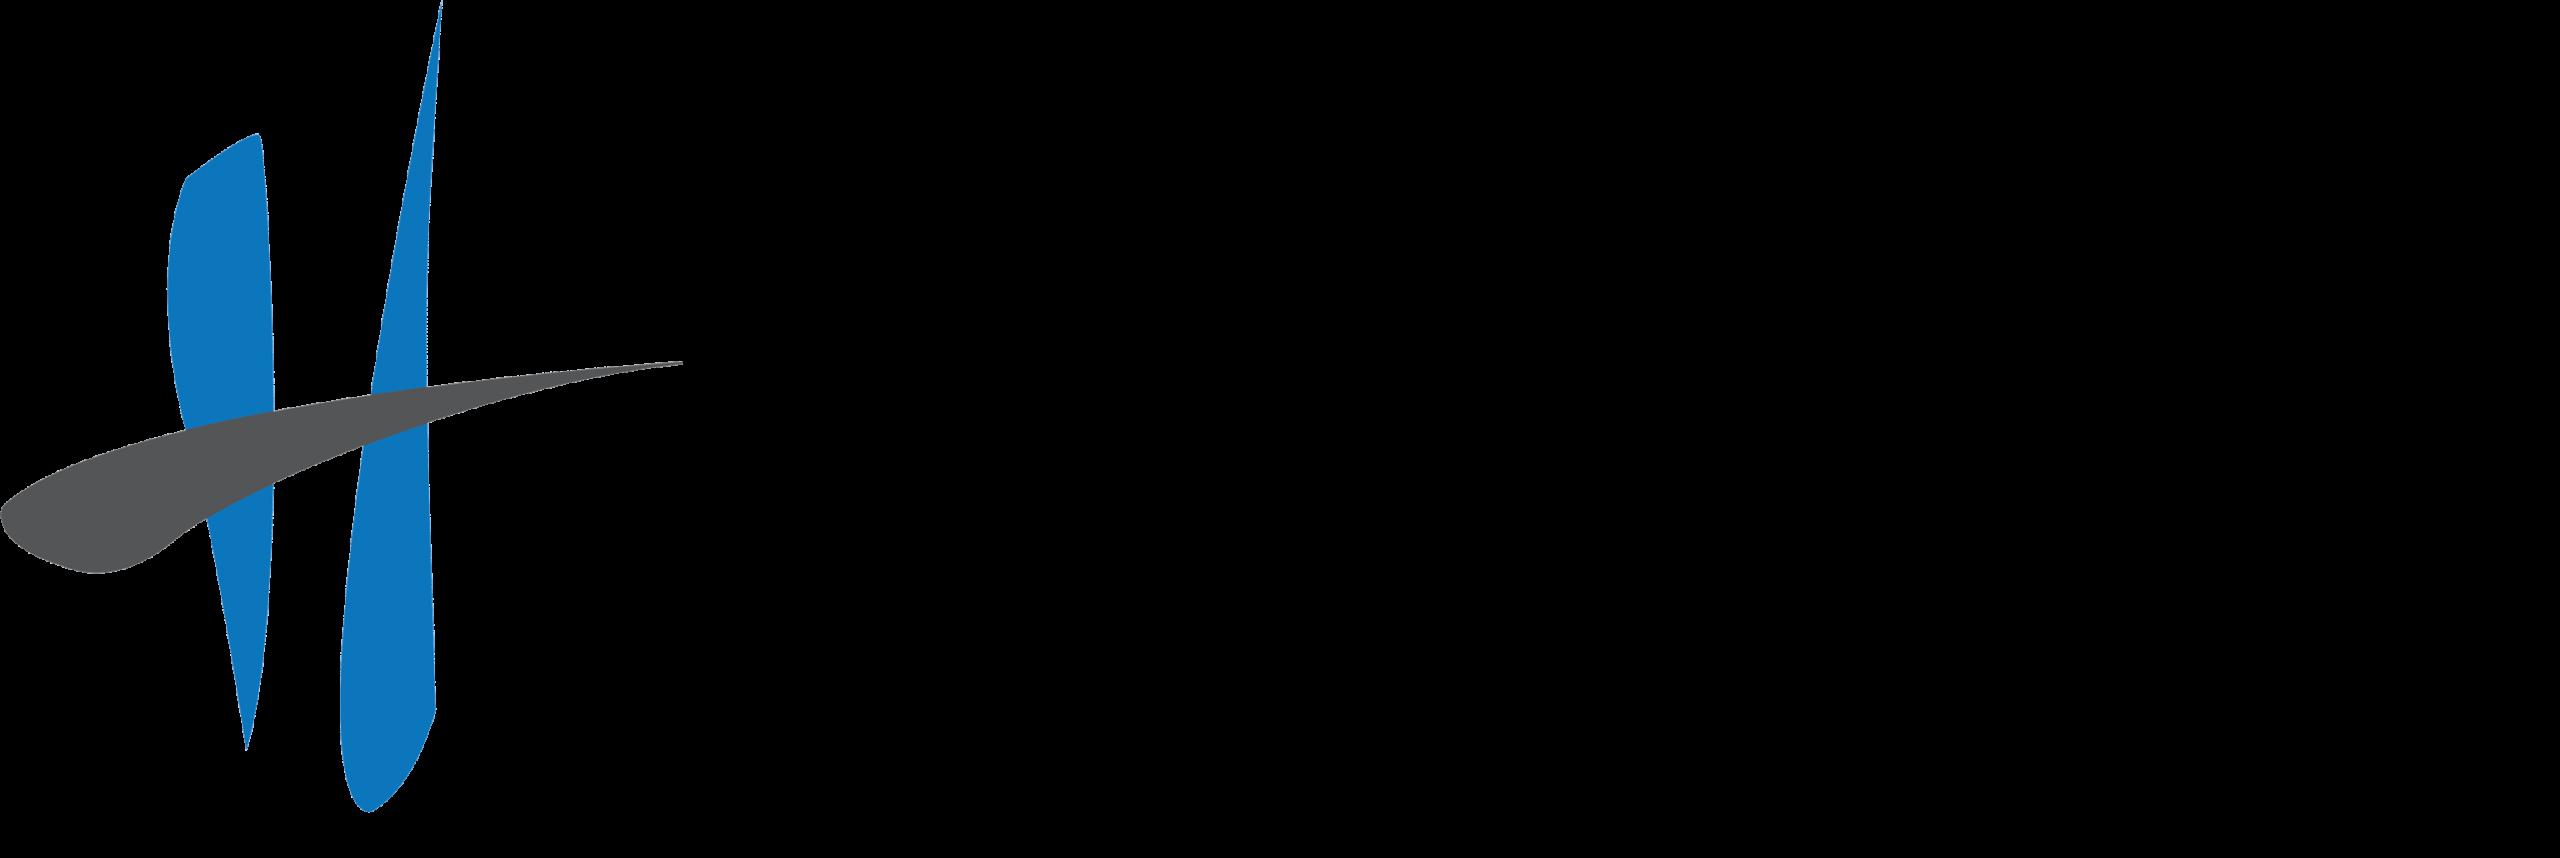 Instant Geyser Price in Pakistan | Hanif Centre